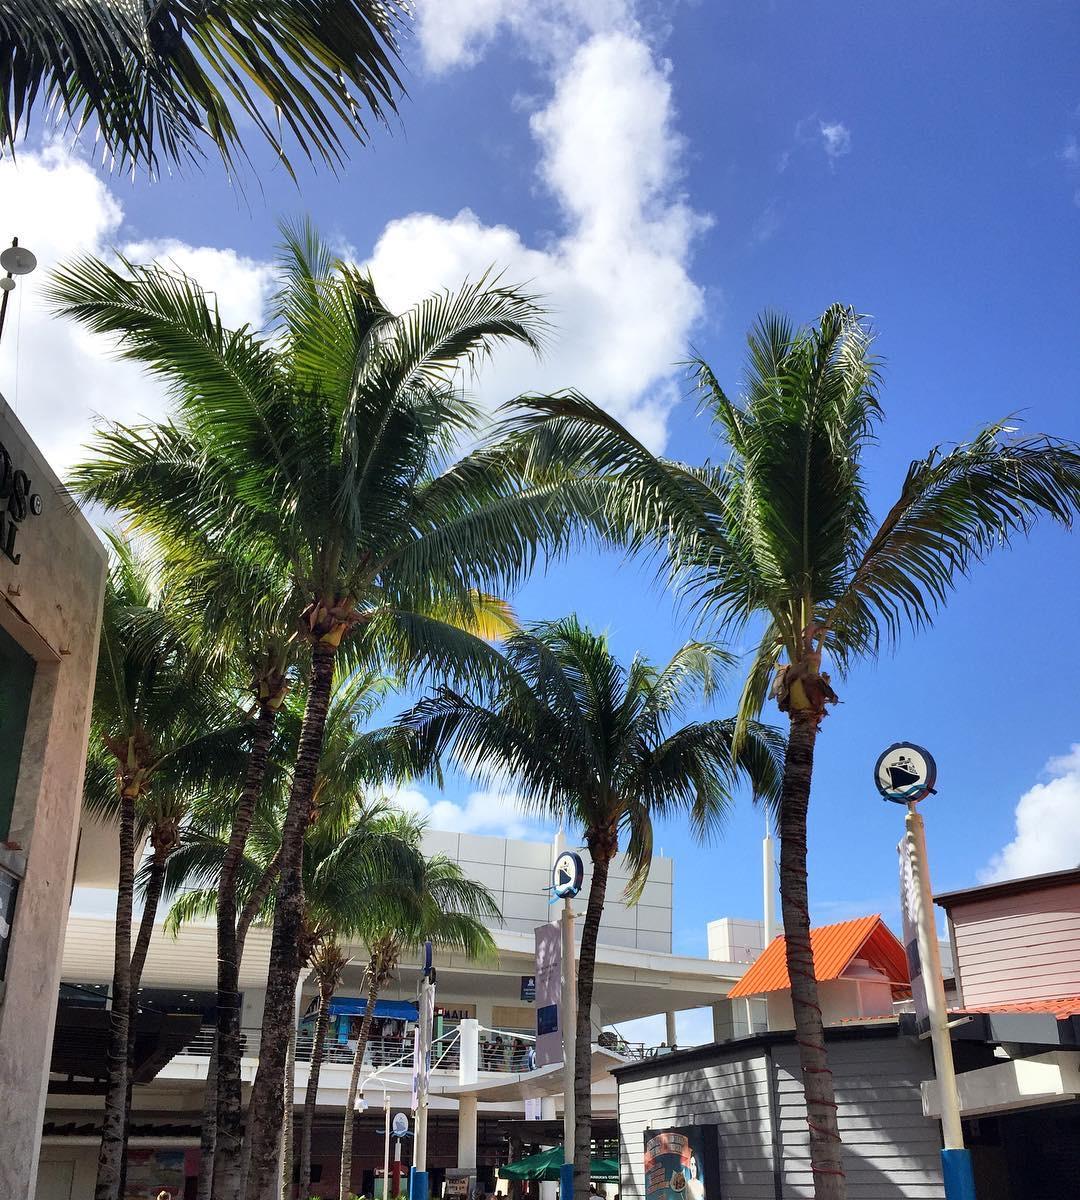 centros comerciales de Cozumel